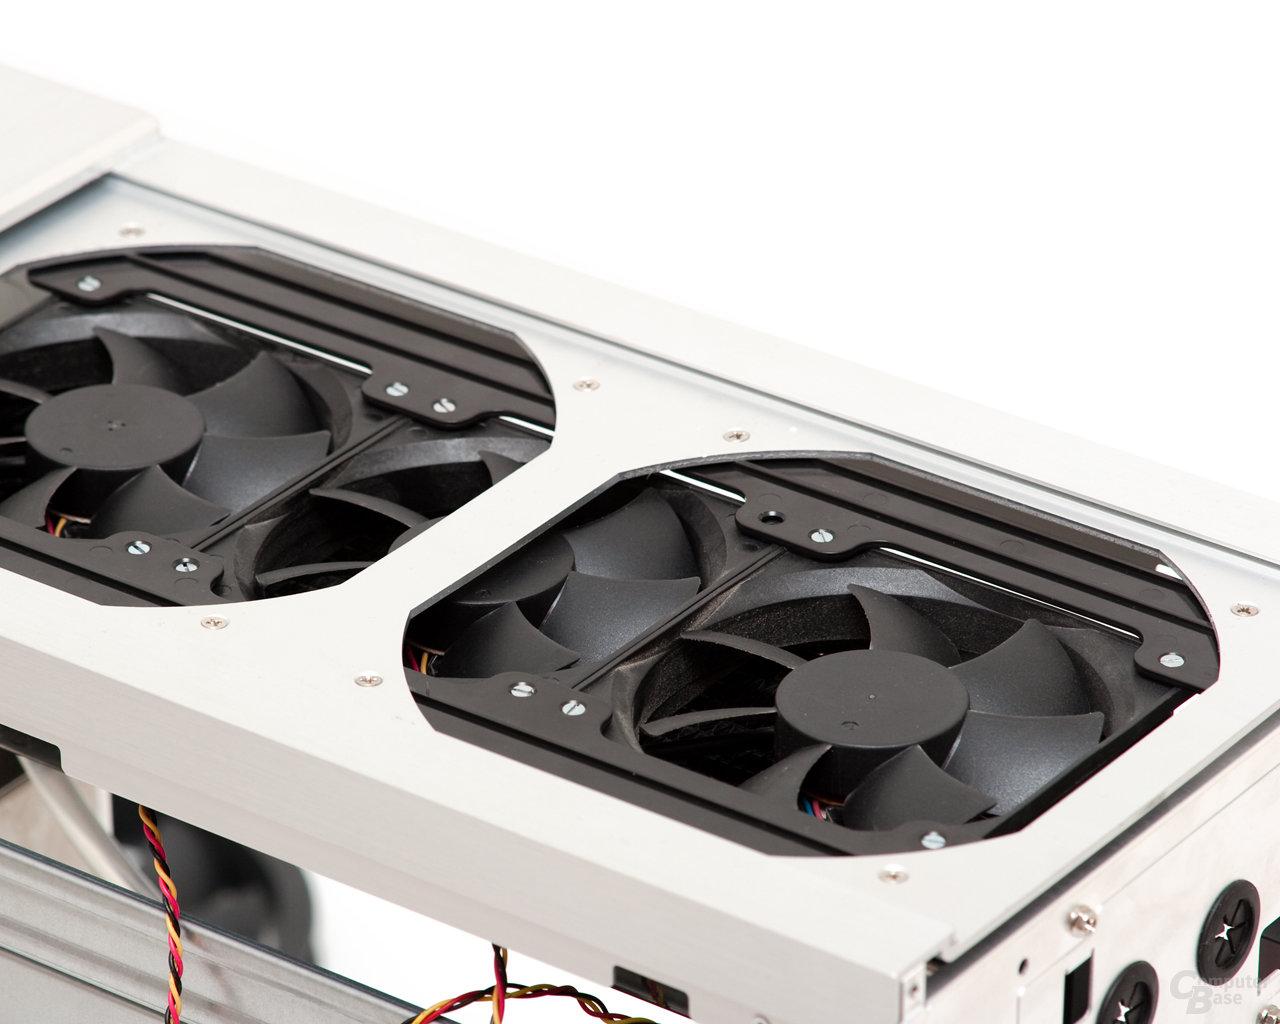 Cooler Master ATCS 840 – Radiator